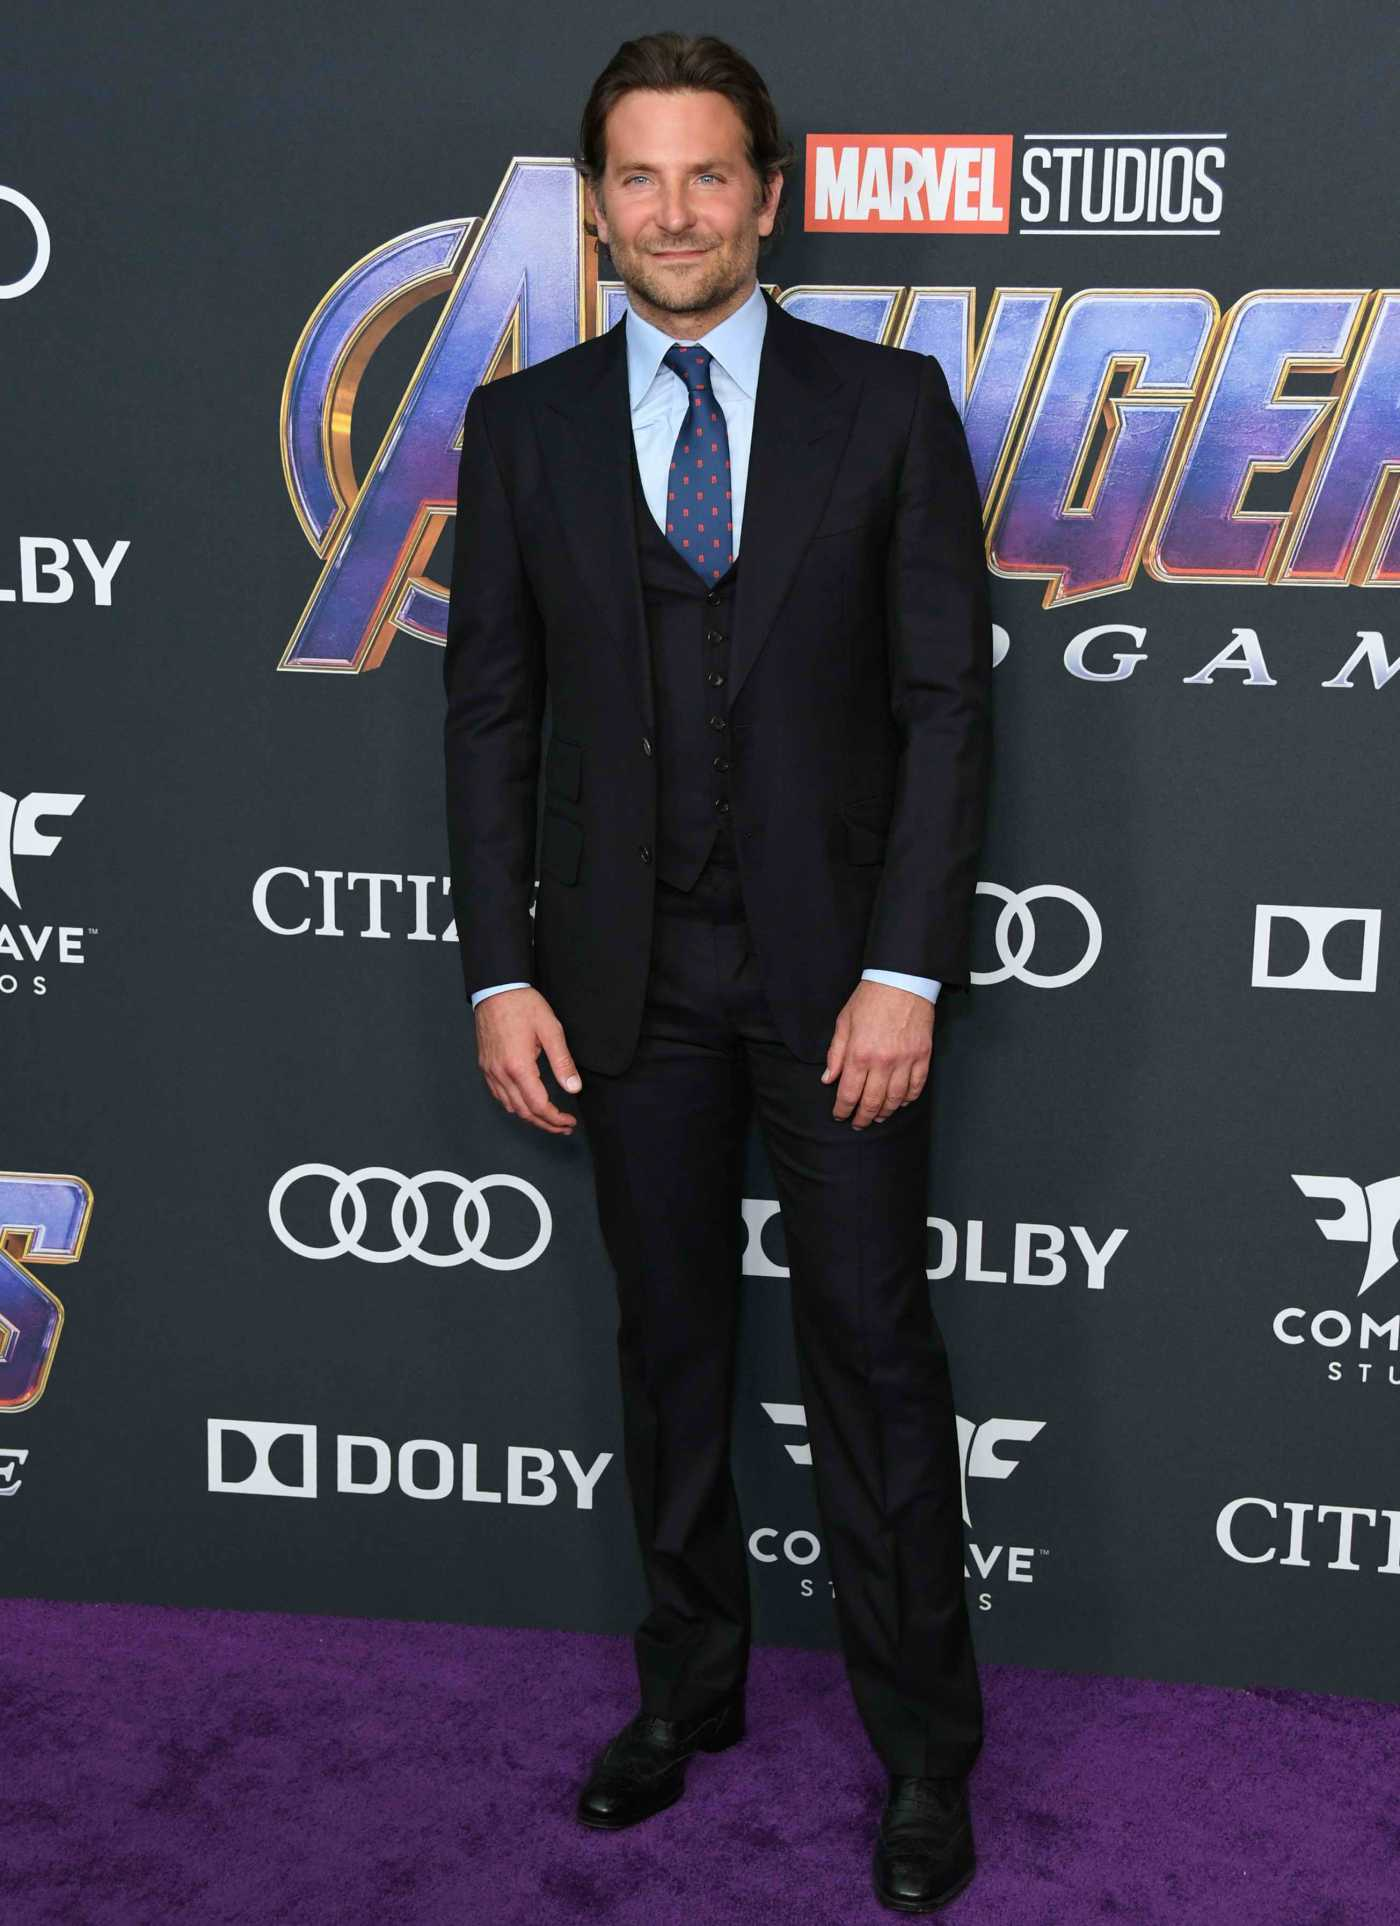 Bradley Cooper Attends Avengers: Endgame Premiere in Los Angeles 04/22/2019